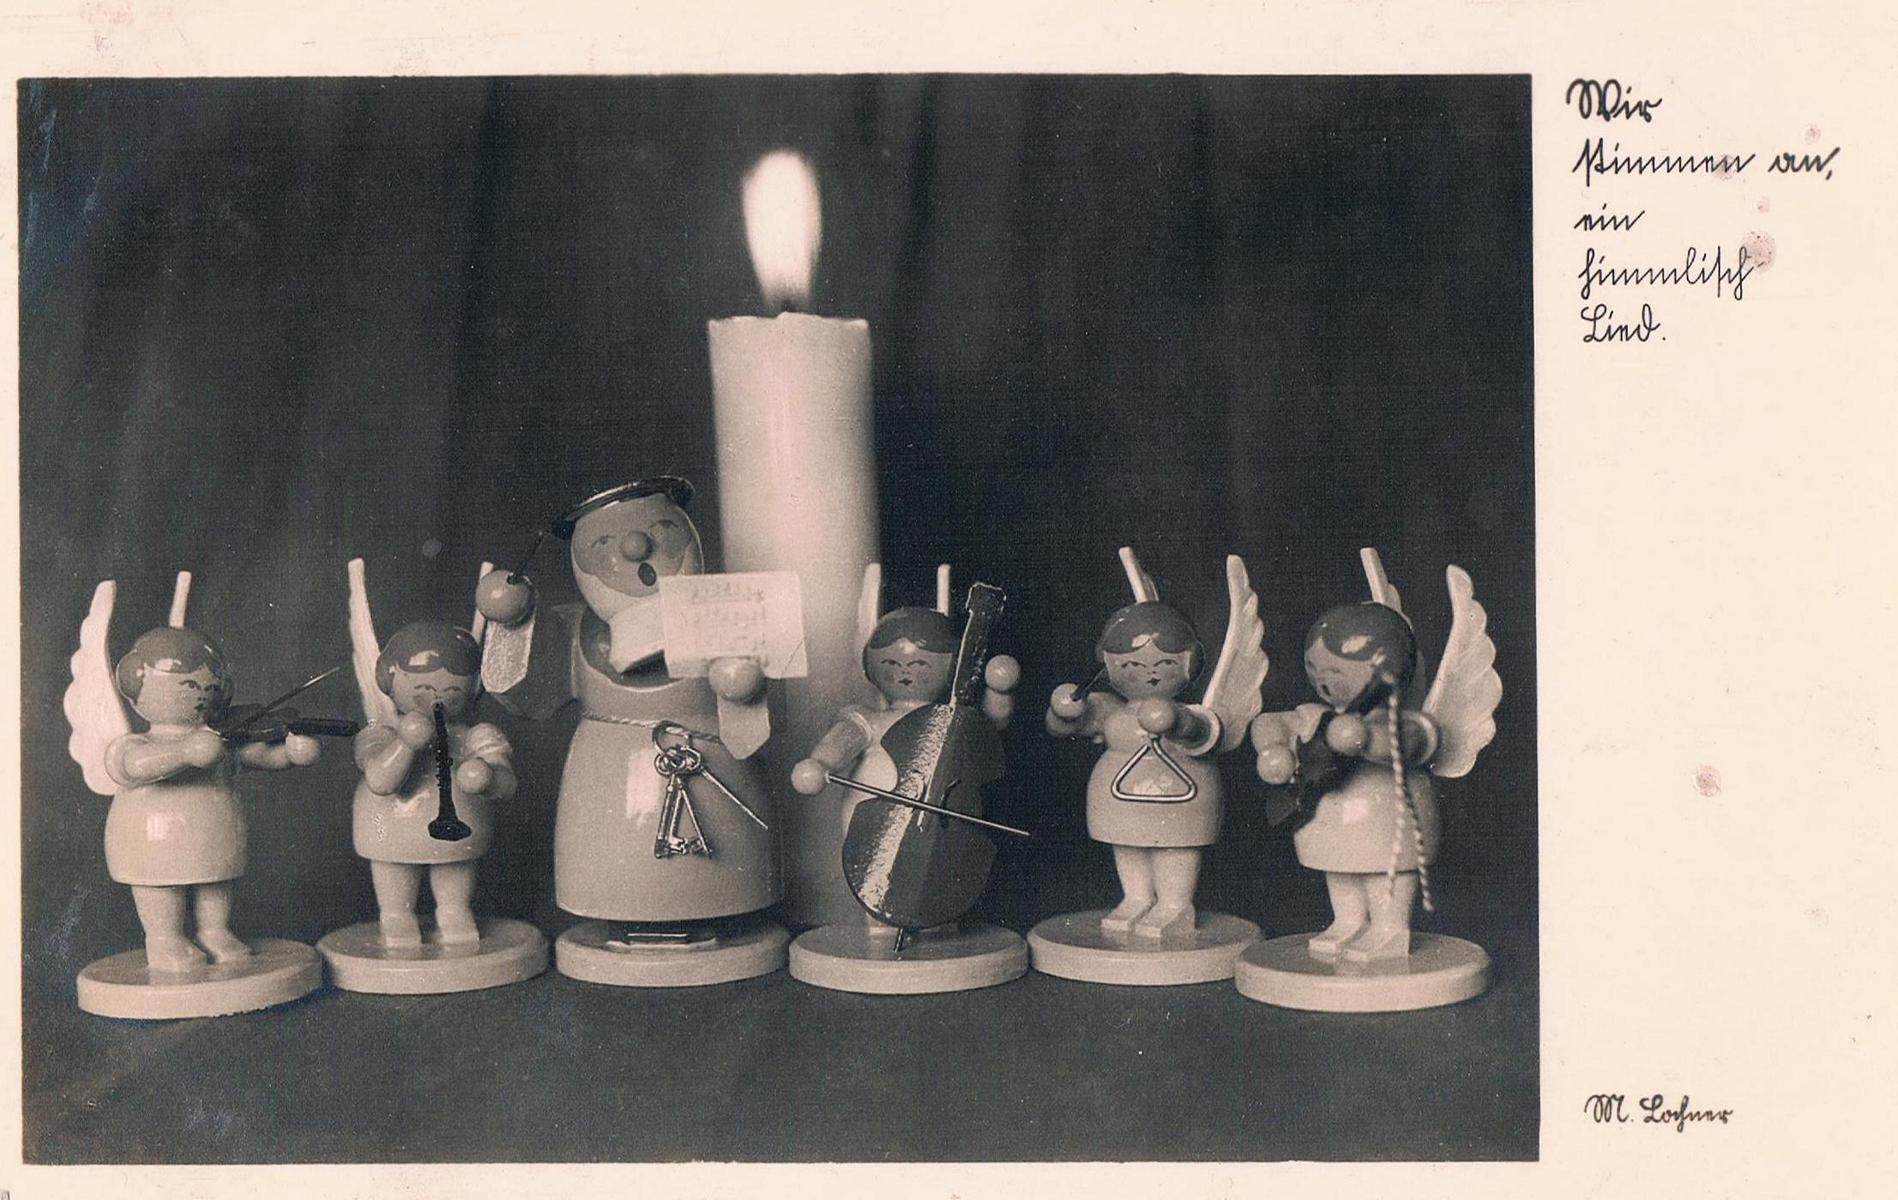 Alte Weohnachtskarten: Religiöses Motiv